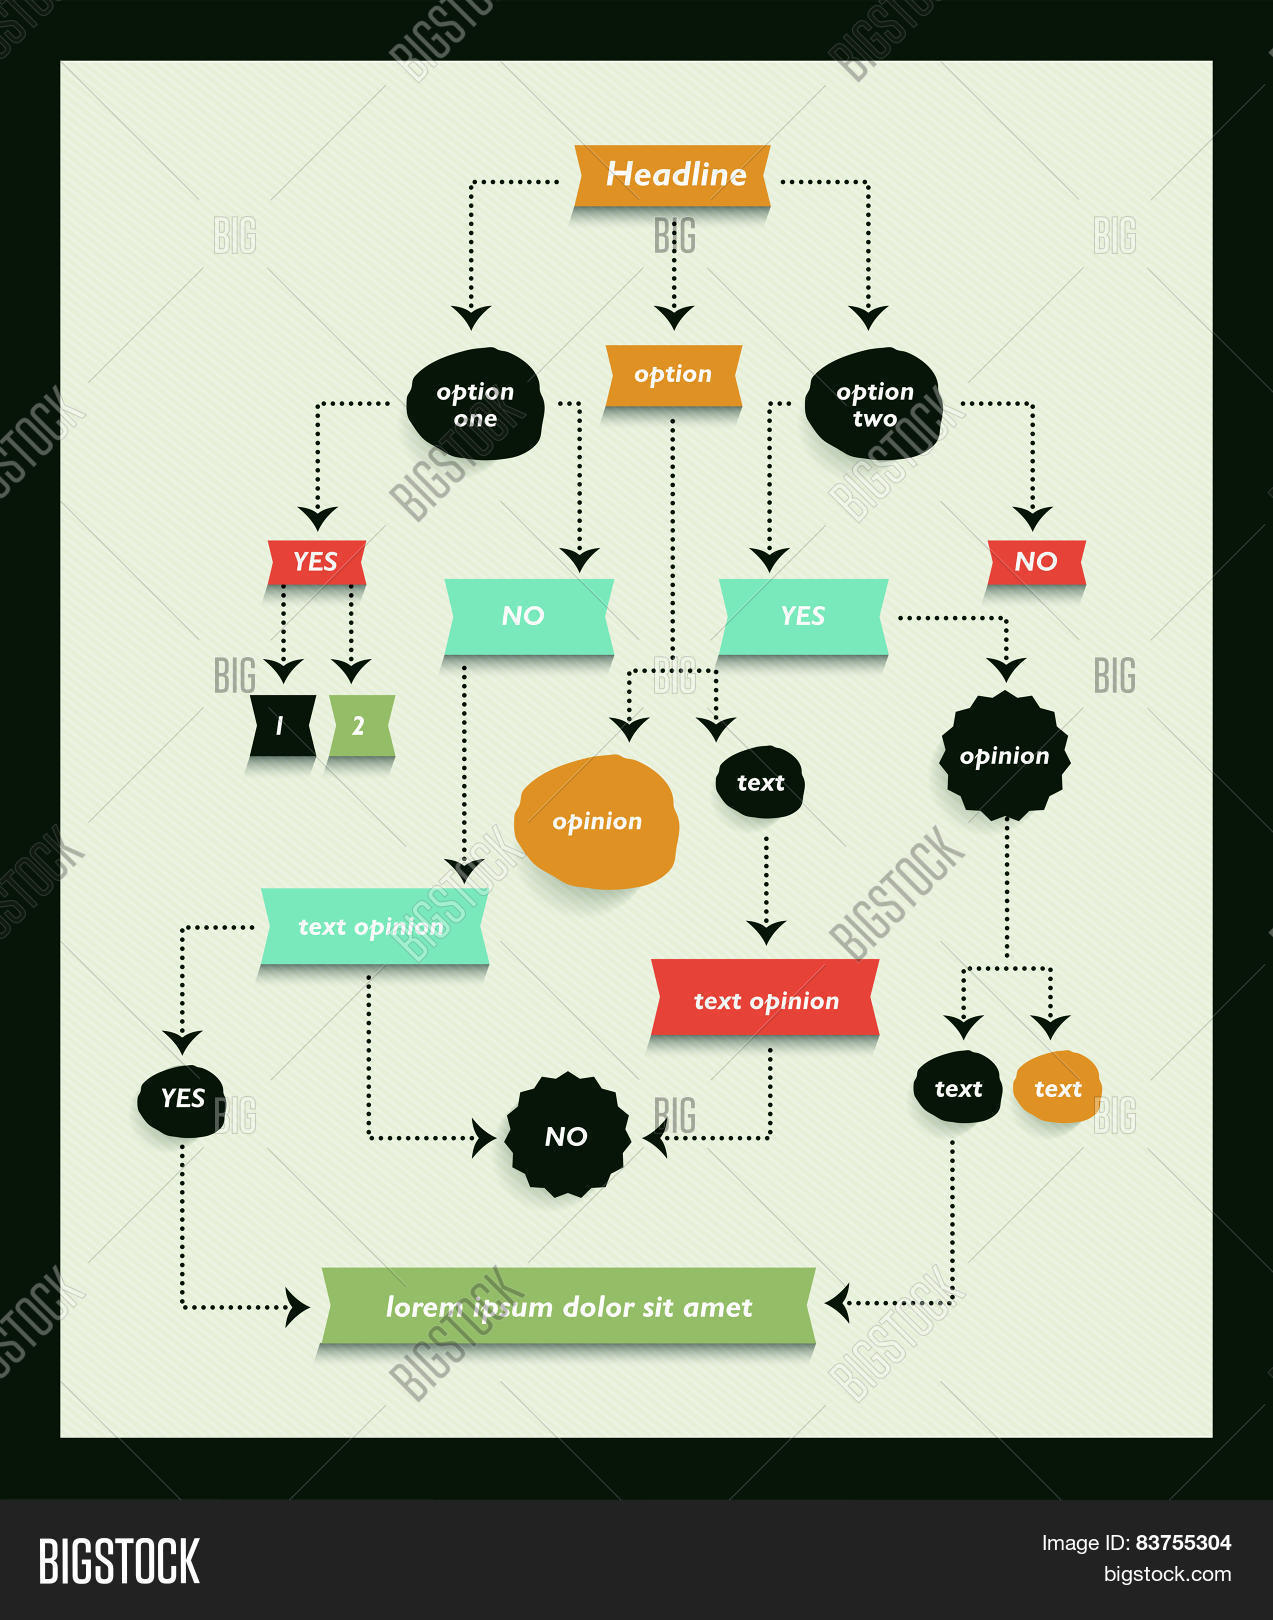 Flow chart diagram vector photo free trial bigstock flow chart diagram scheme infographic algorithm element ccuart Gallery